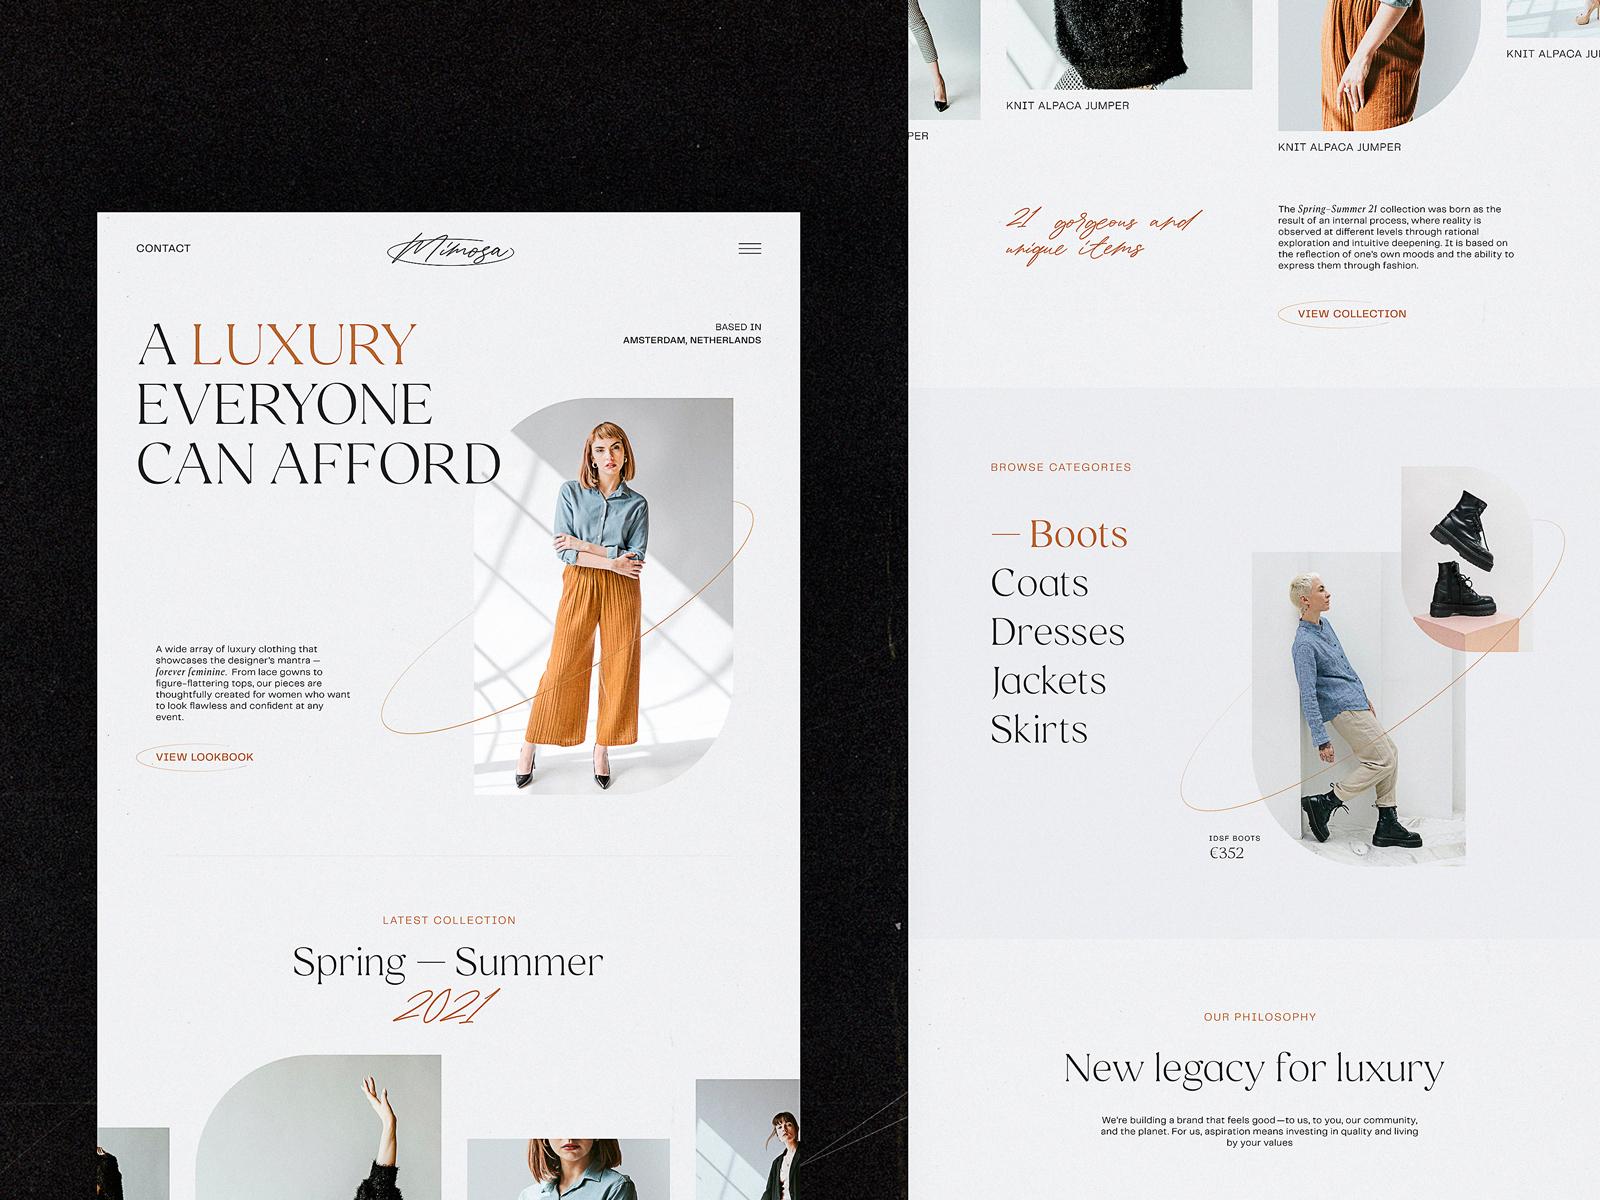 UI Inspiration: 20+ Web Design Concepts for E-Commerce